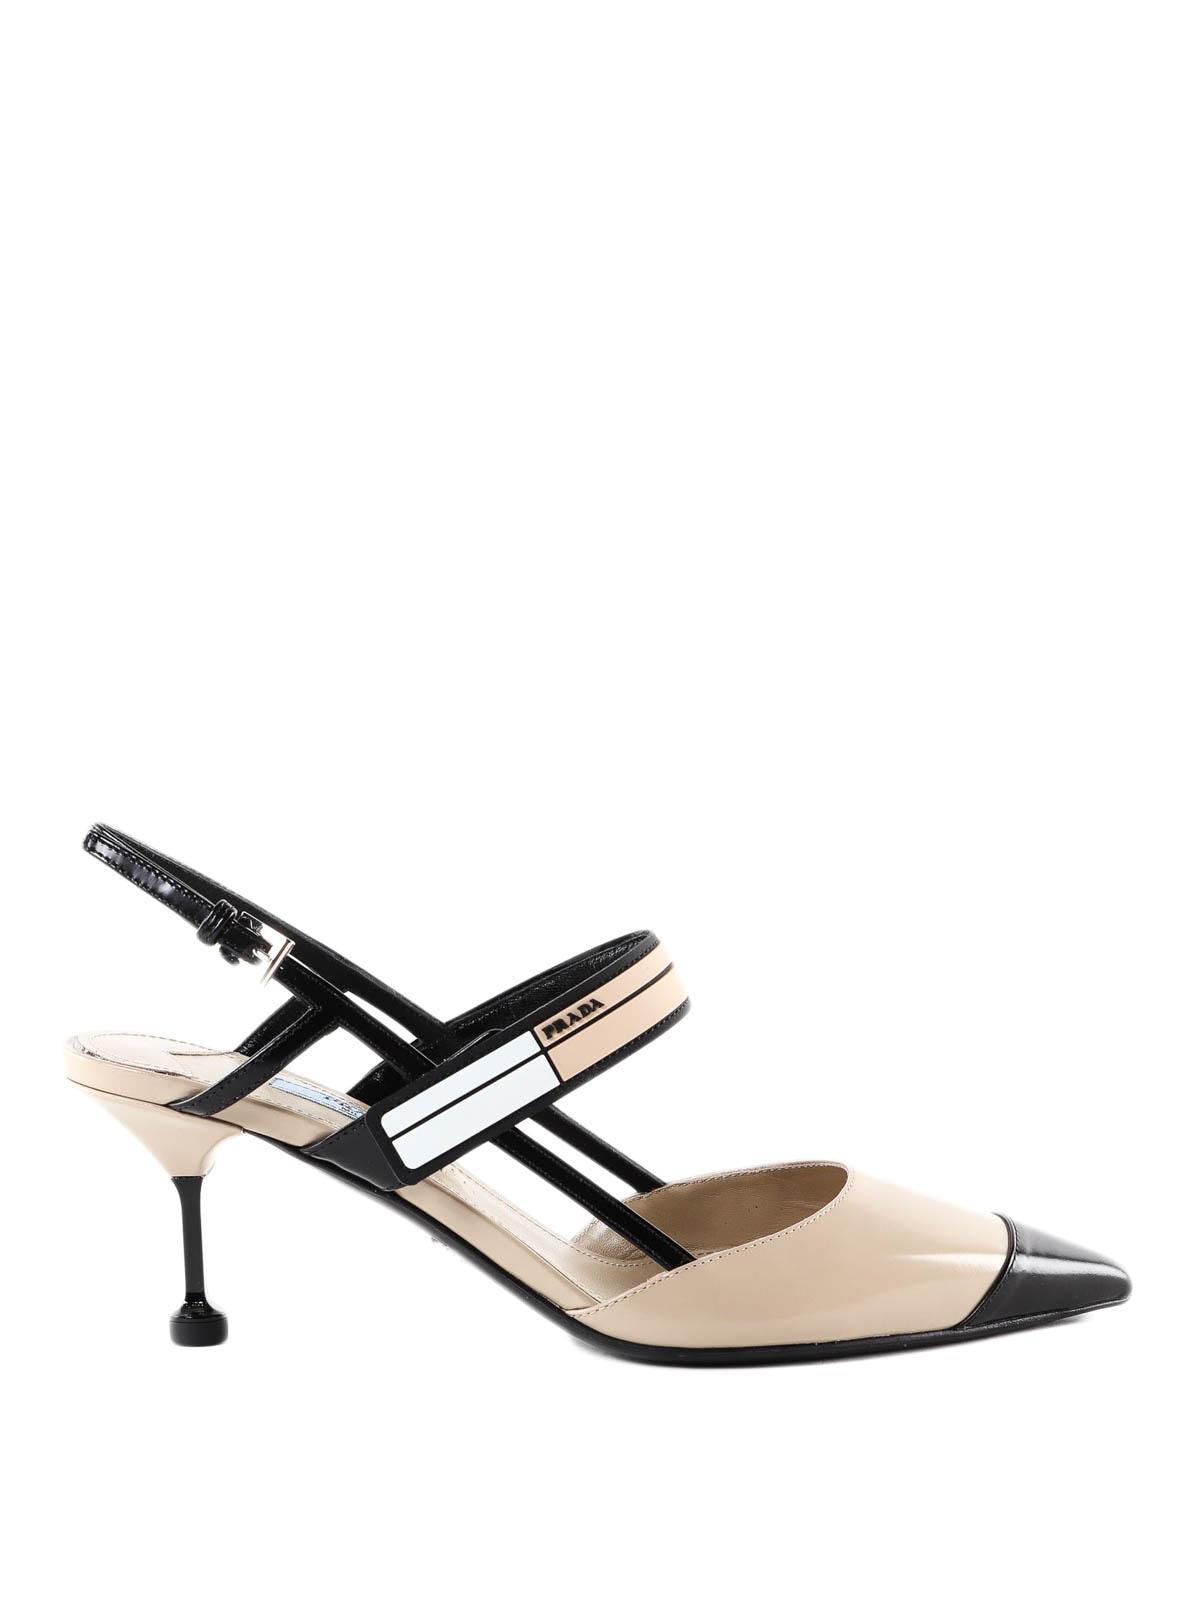 8ab52297d033 Prada - Modern two-tone leather slingbacks - court shoes - 1I296IAZ3 MJV